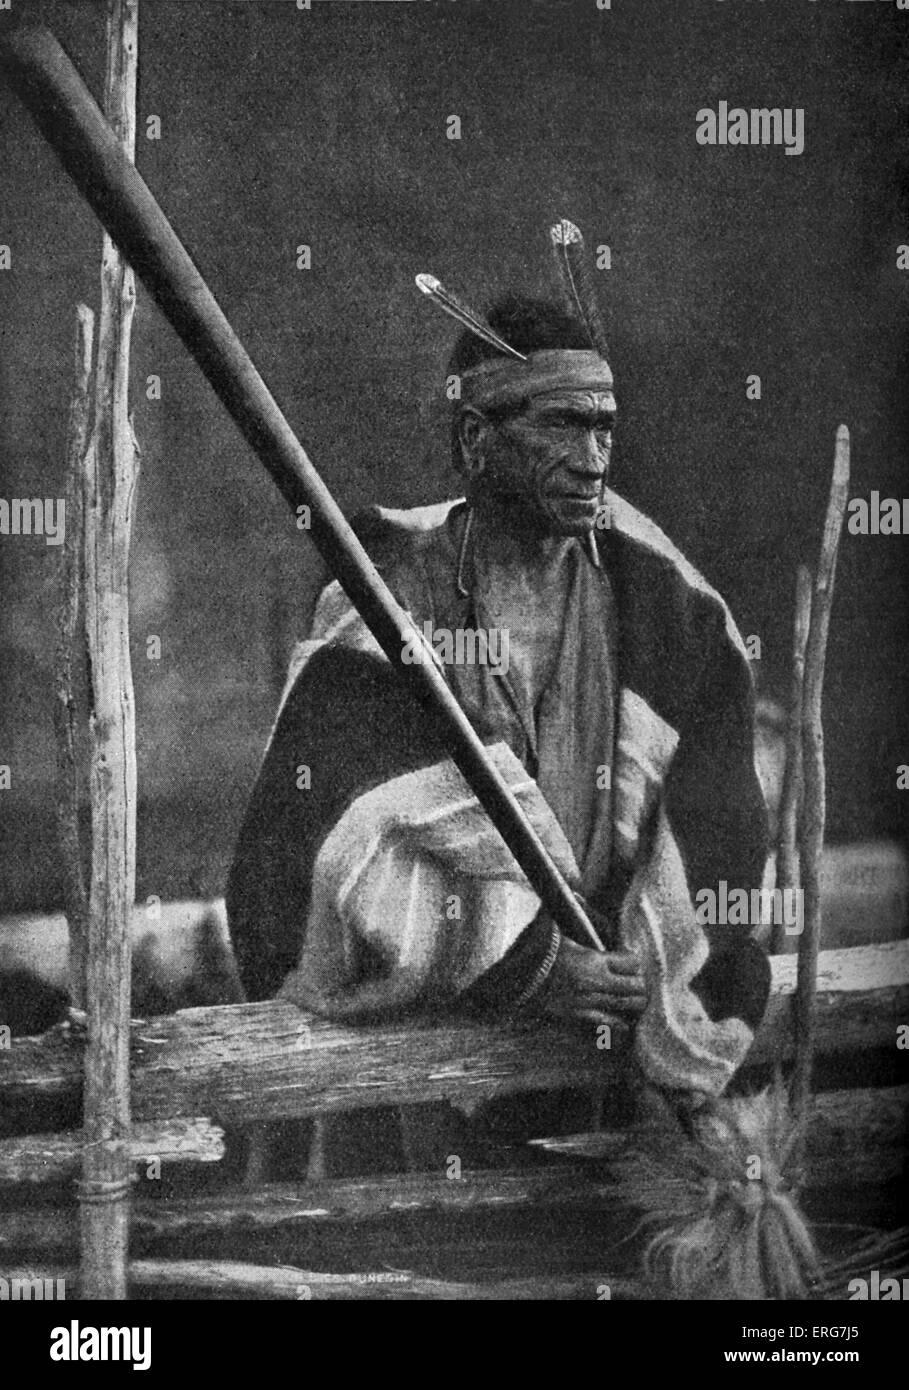 Te Hauhau - Maori warrior. Indigenous Polynesian people of New Zealand (Aotearoa). From late 1920s. - Stock Image